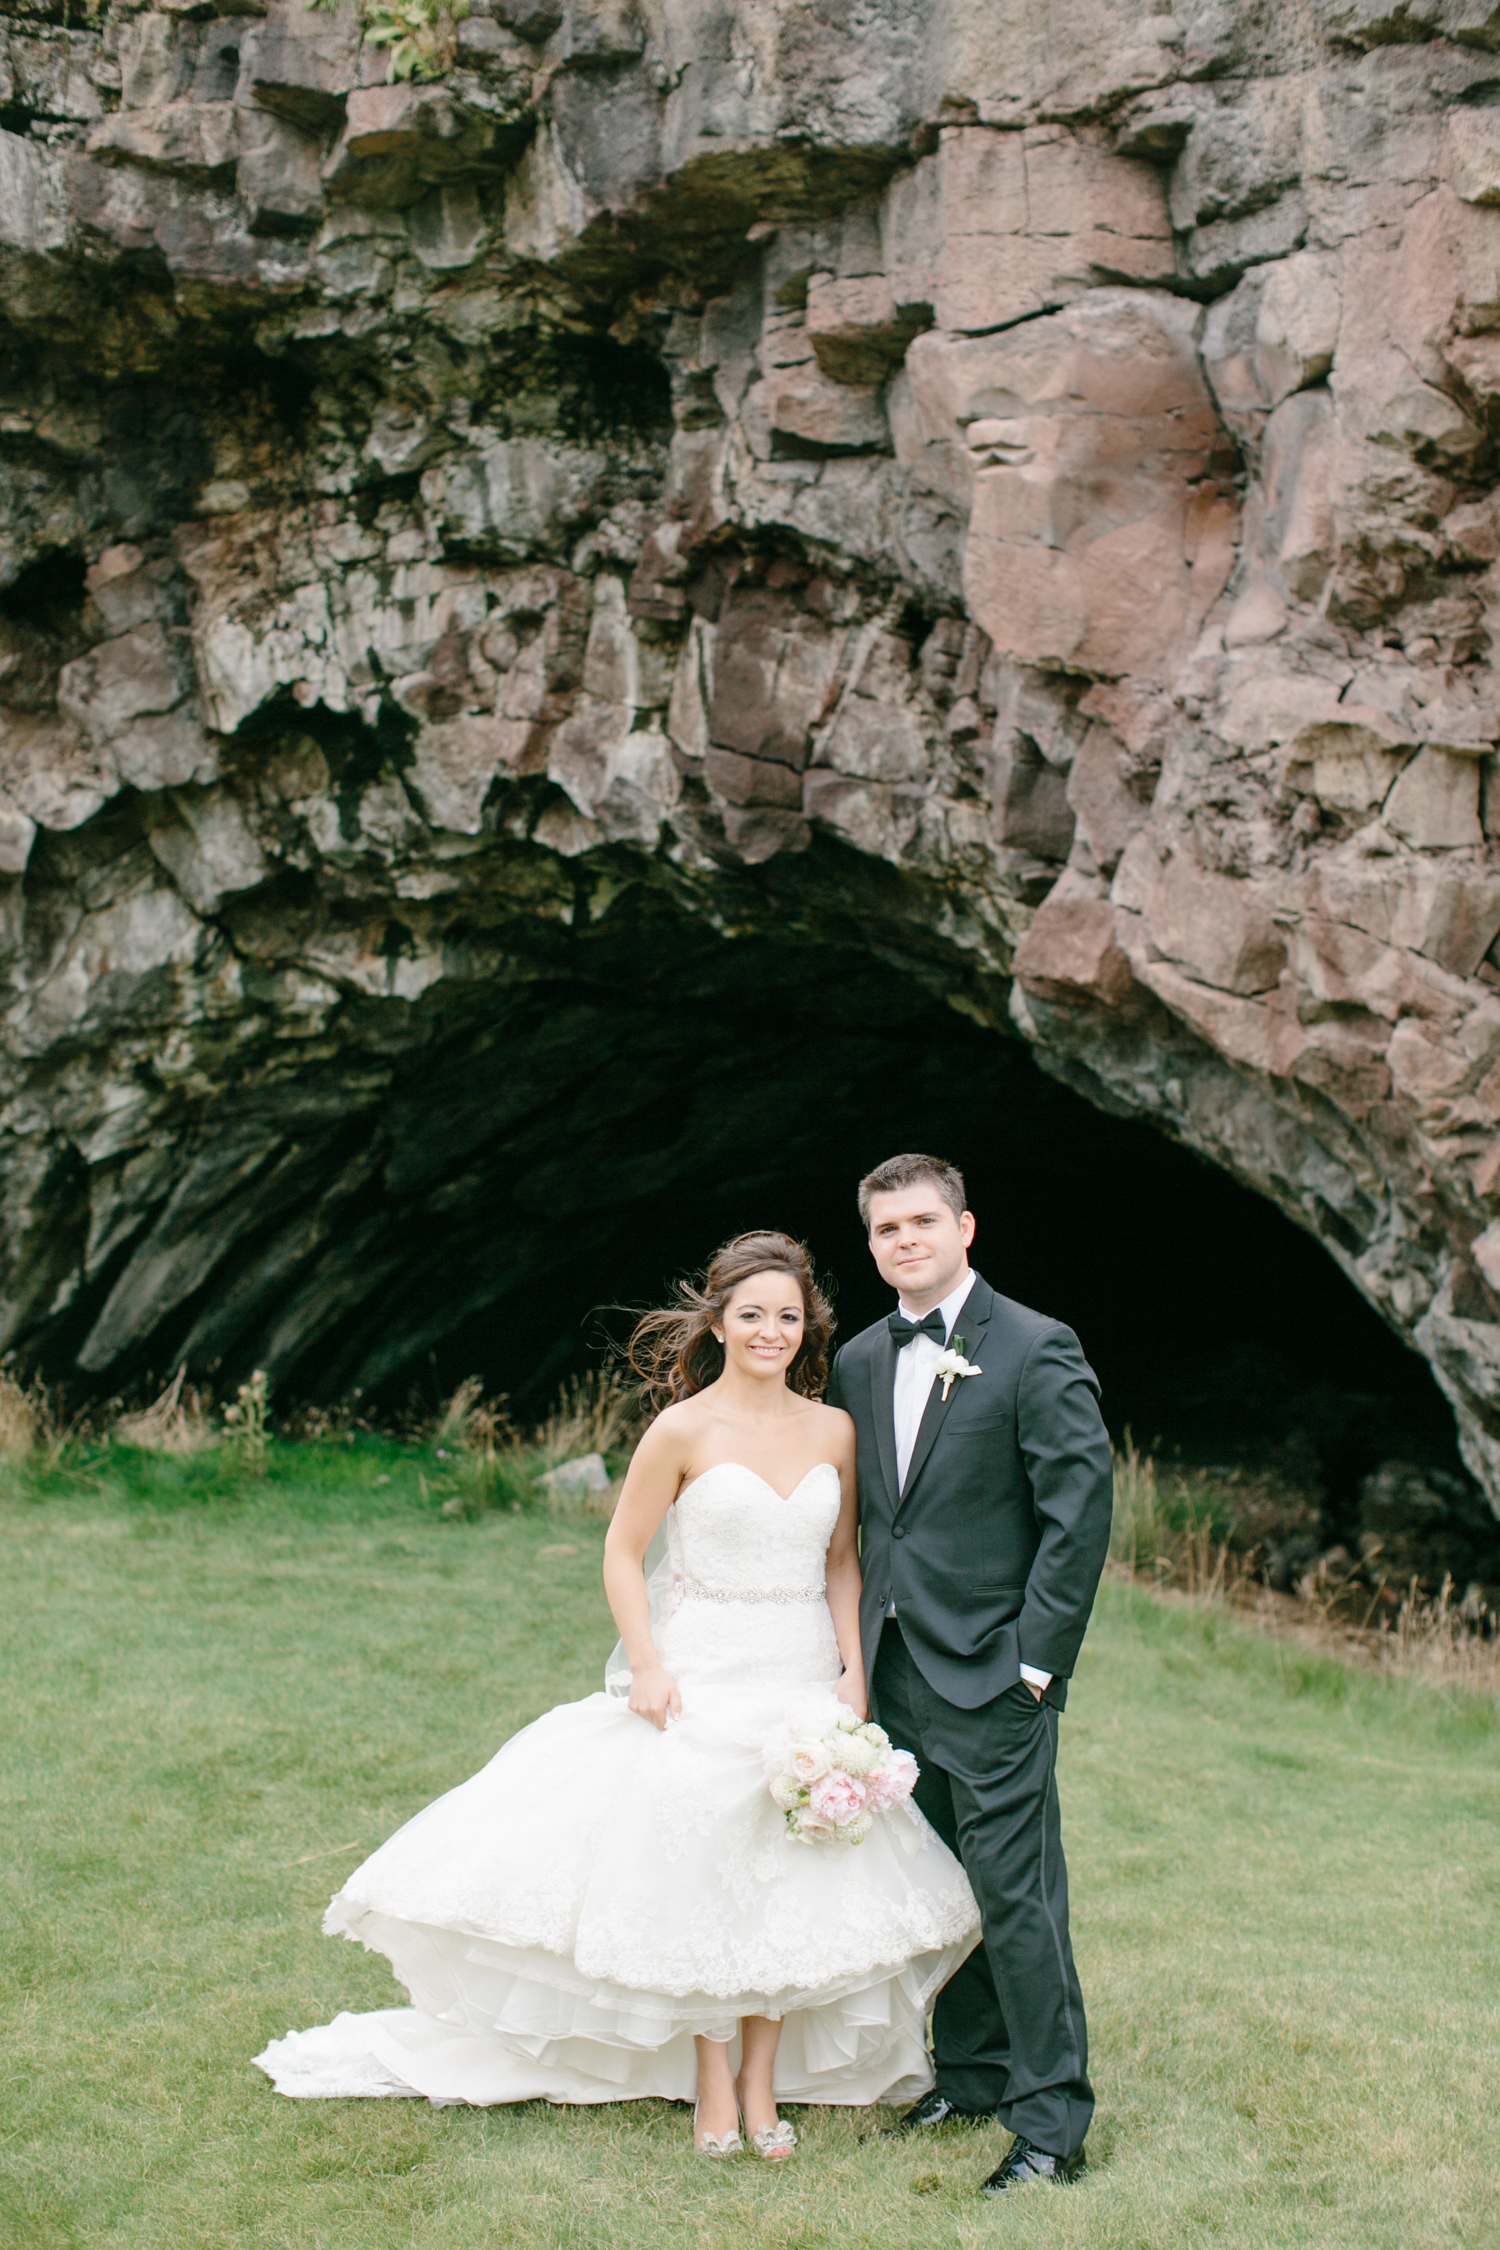 Bend Oregon Pronghorn Wedding by Michelle Cross-1.jpg